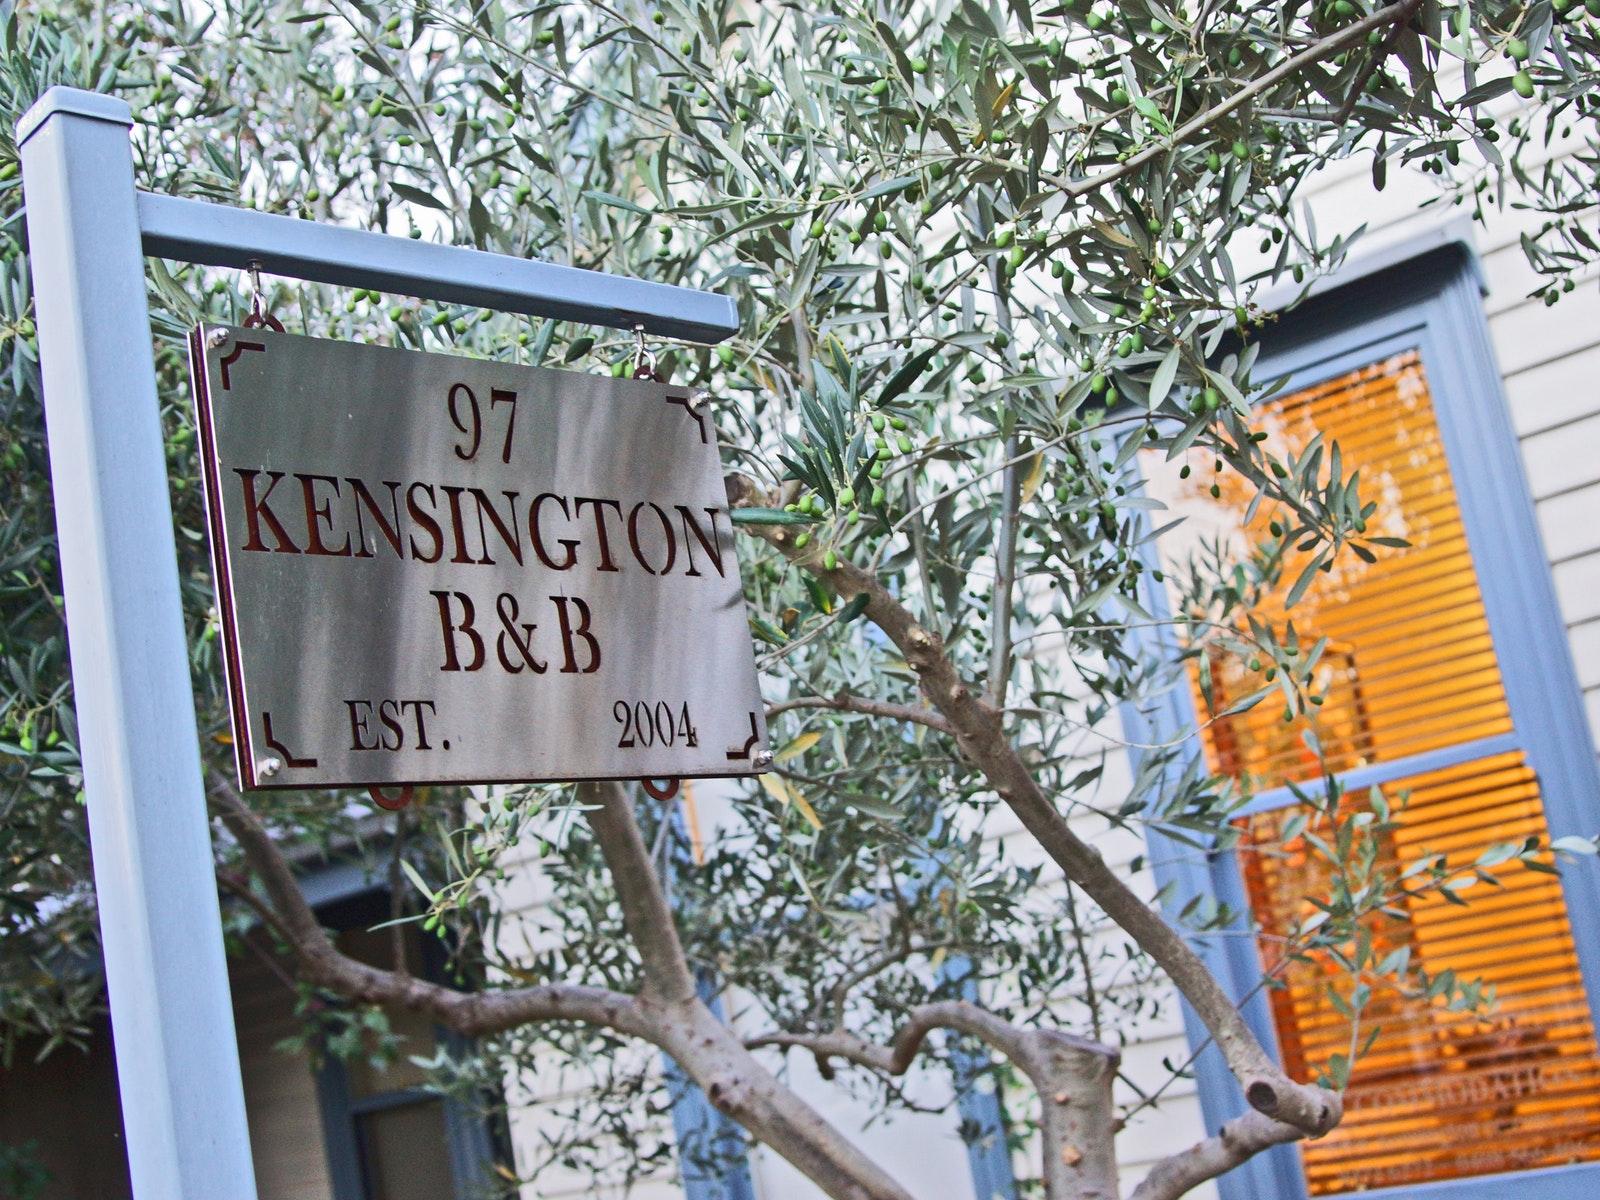 Welcome to Kensington B&B